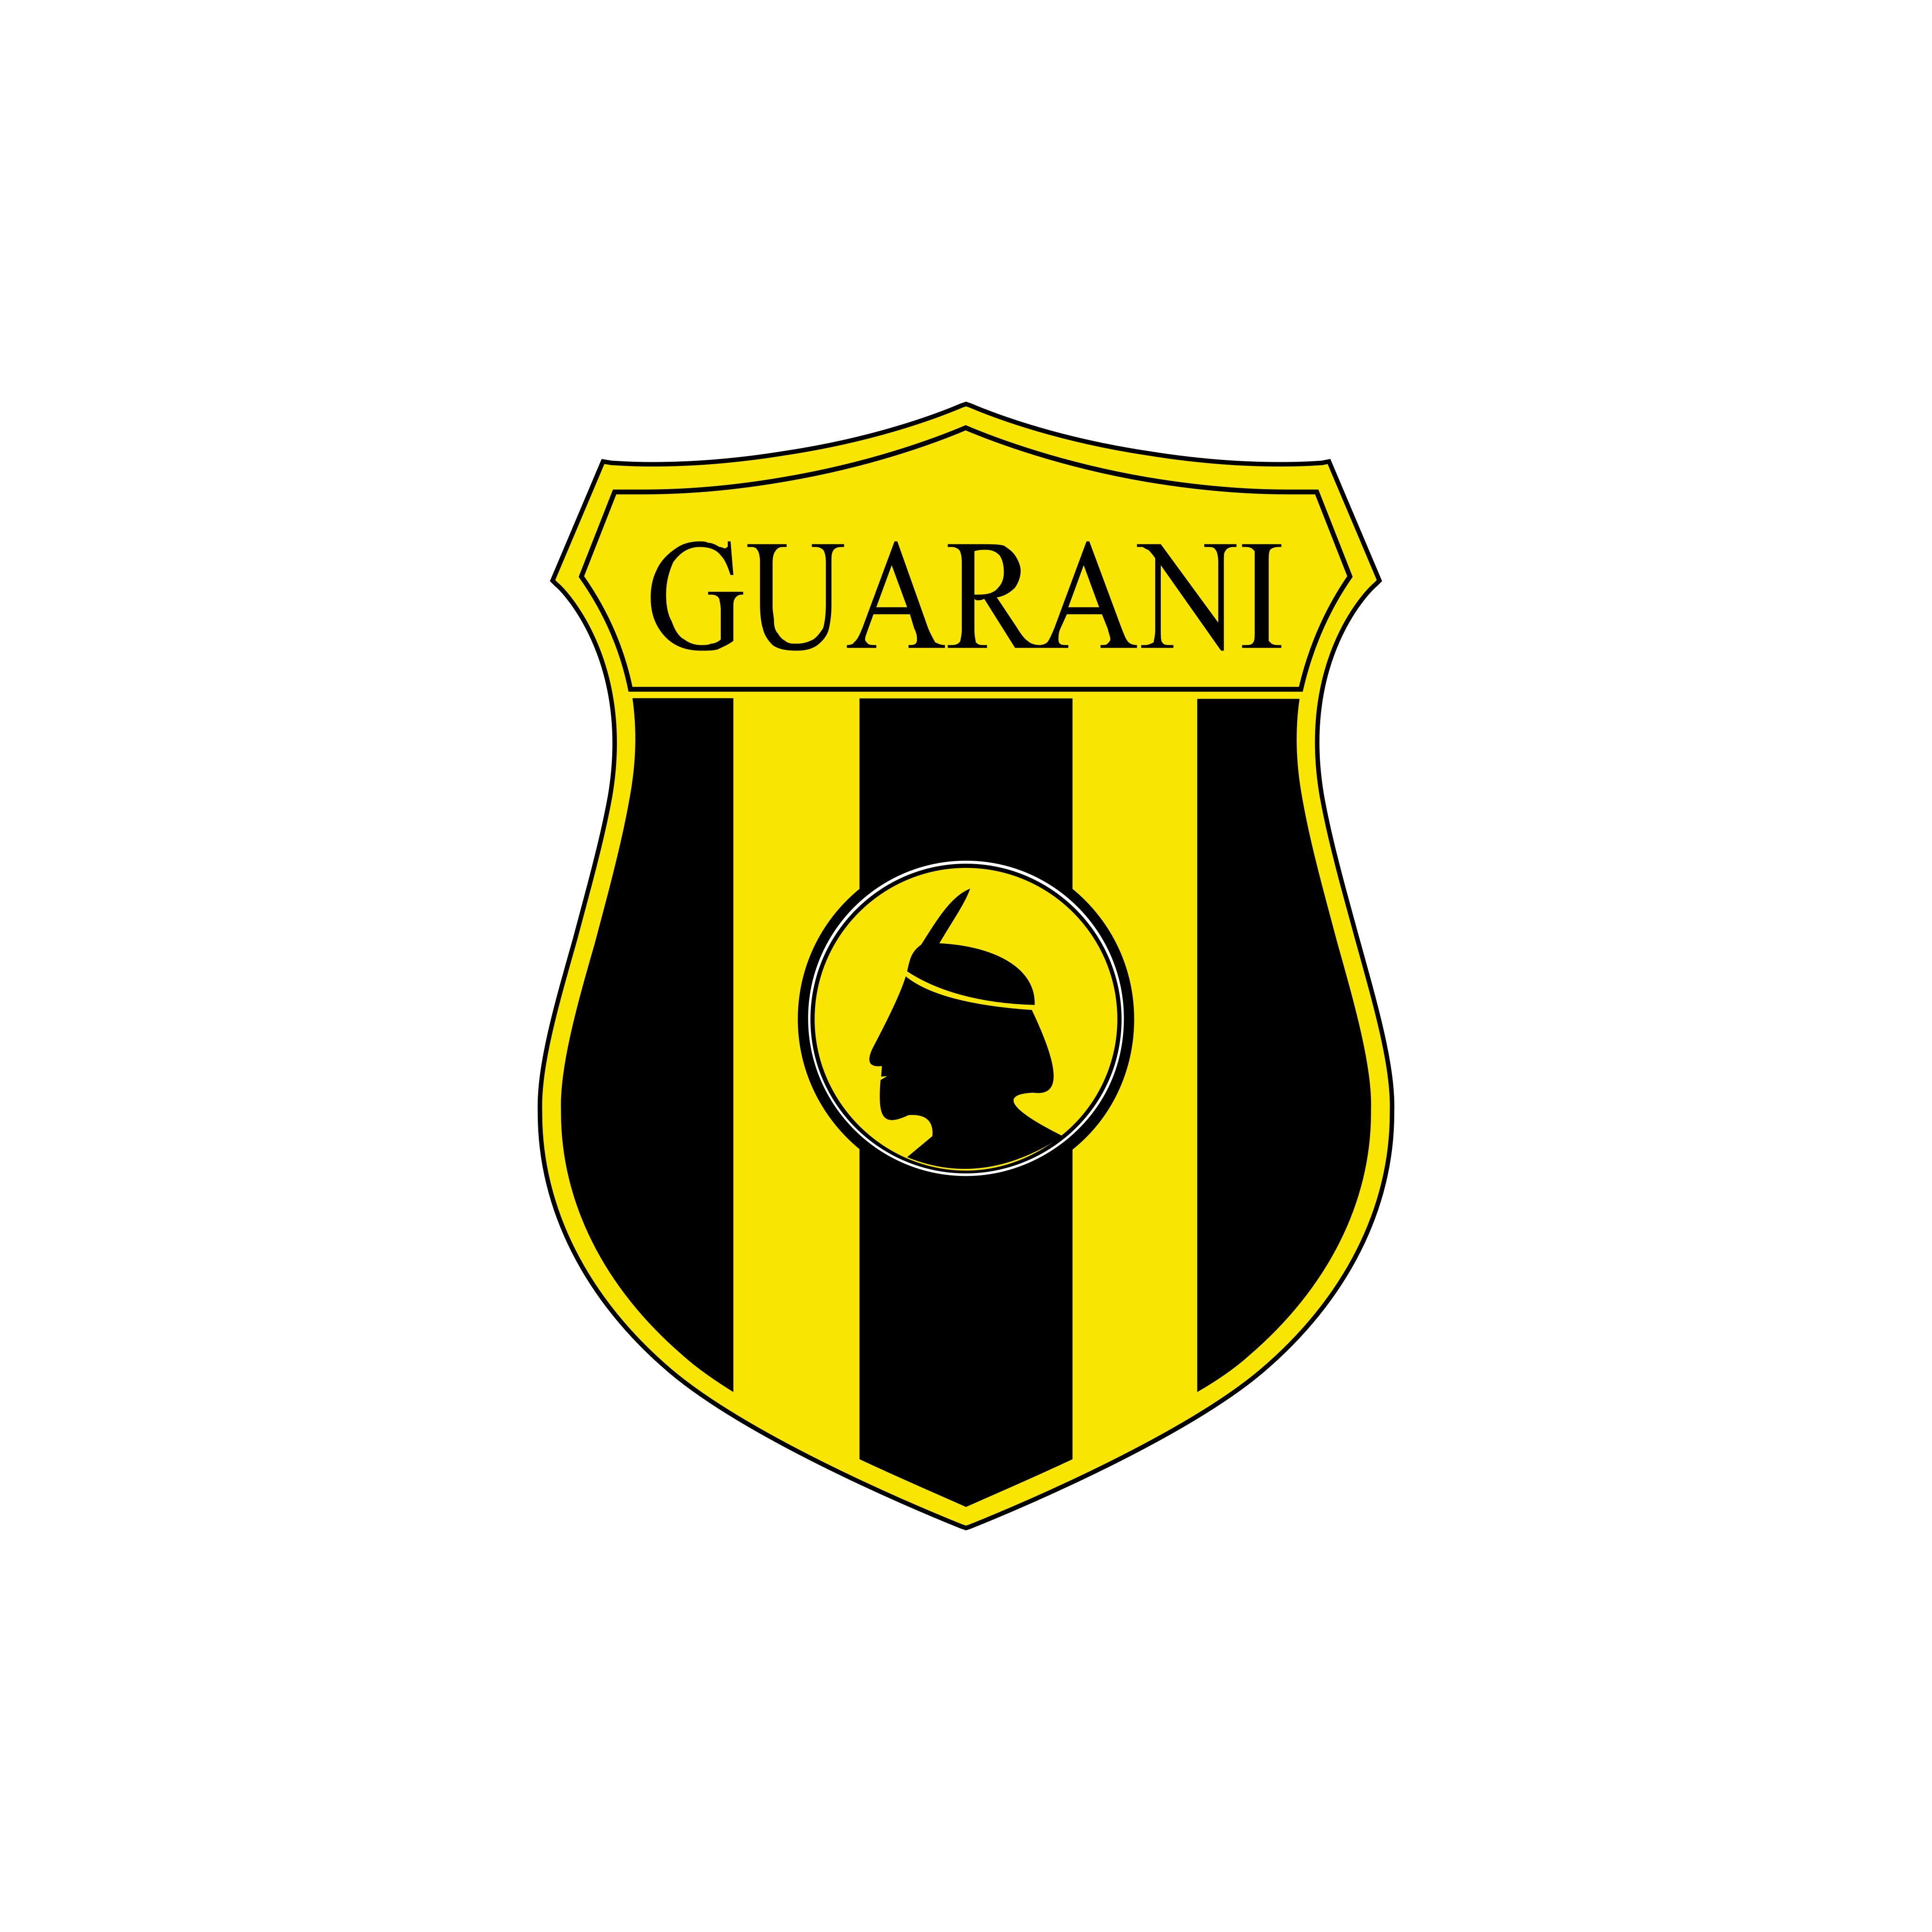 club guarani logo 0 - Club Guaraní Logo – Escudo